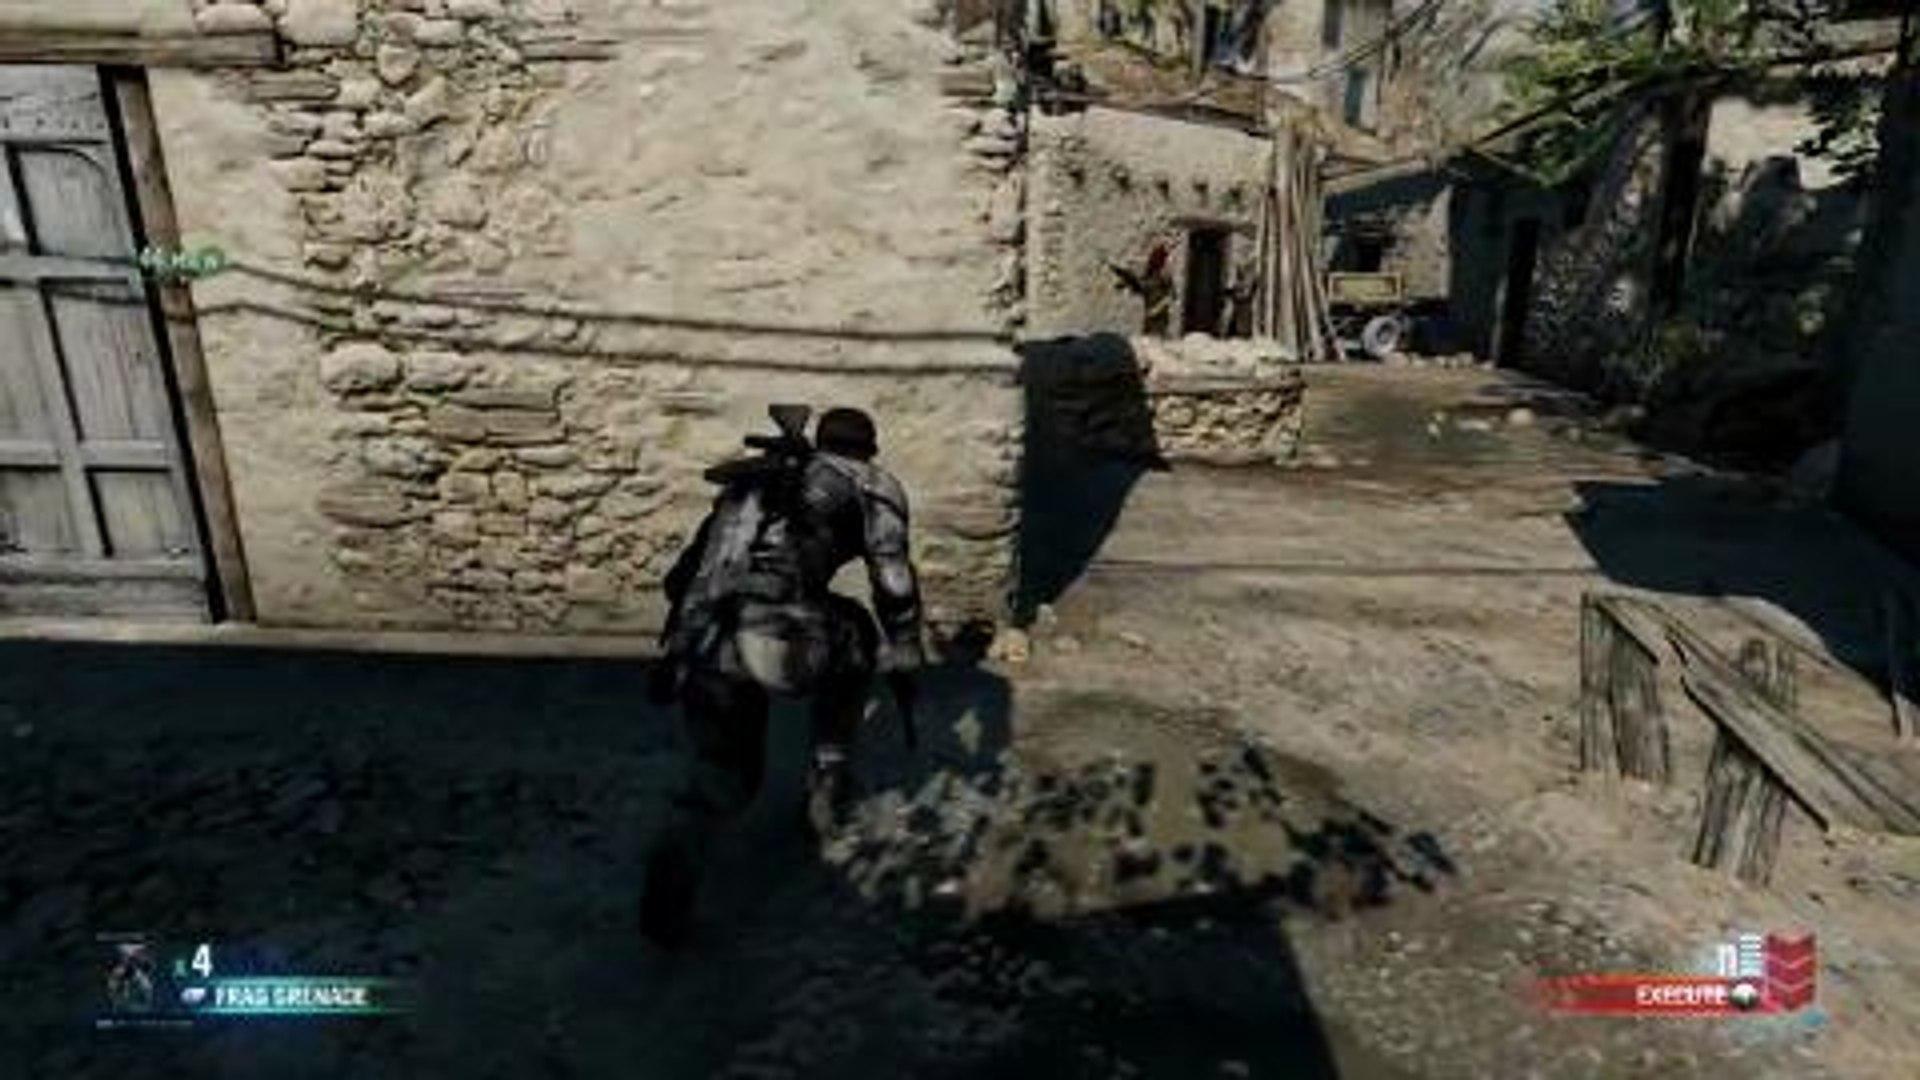 Splinter Cell Blacklist - Gameplay